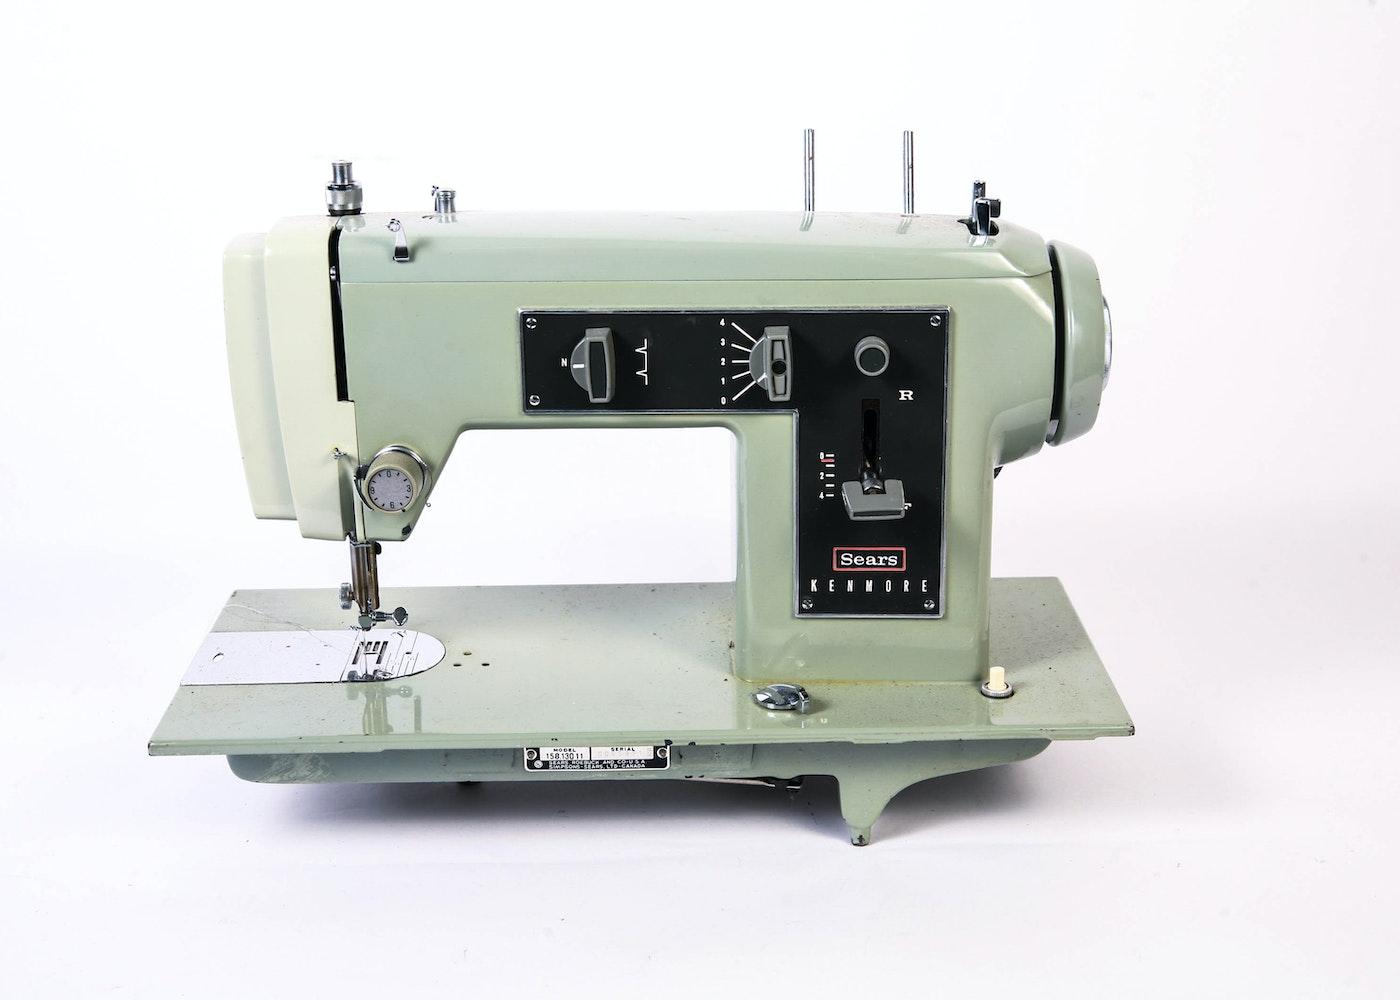 kenmore sewing machine 158 manual